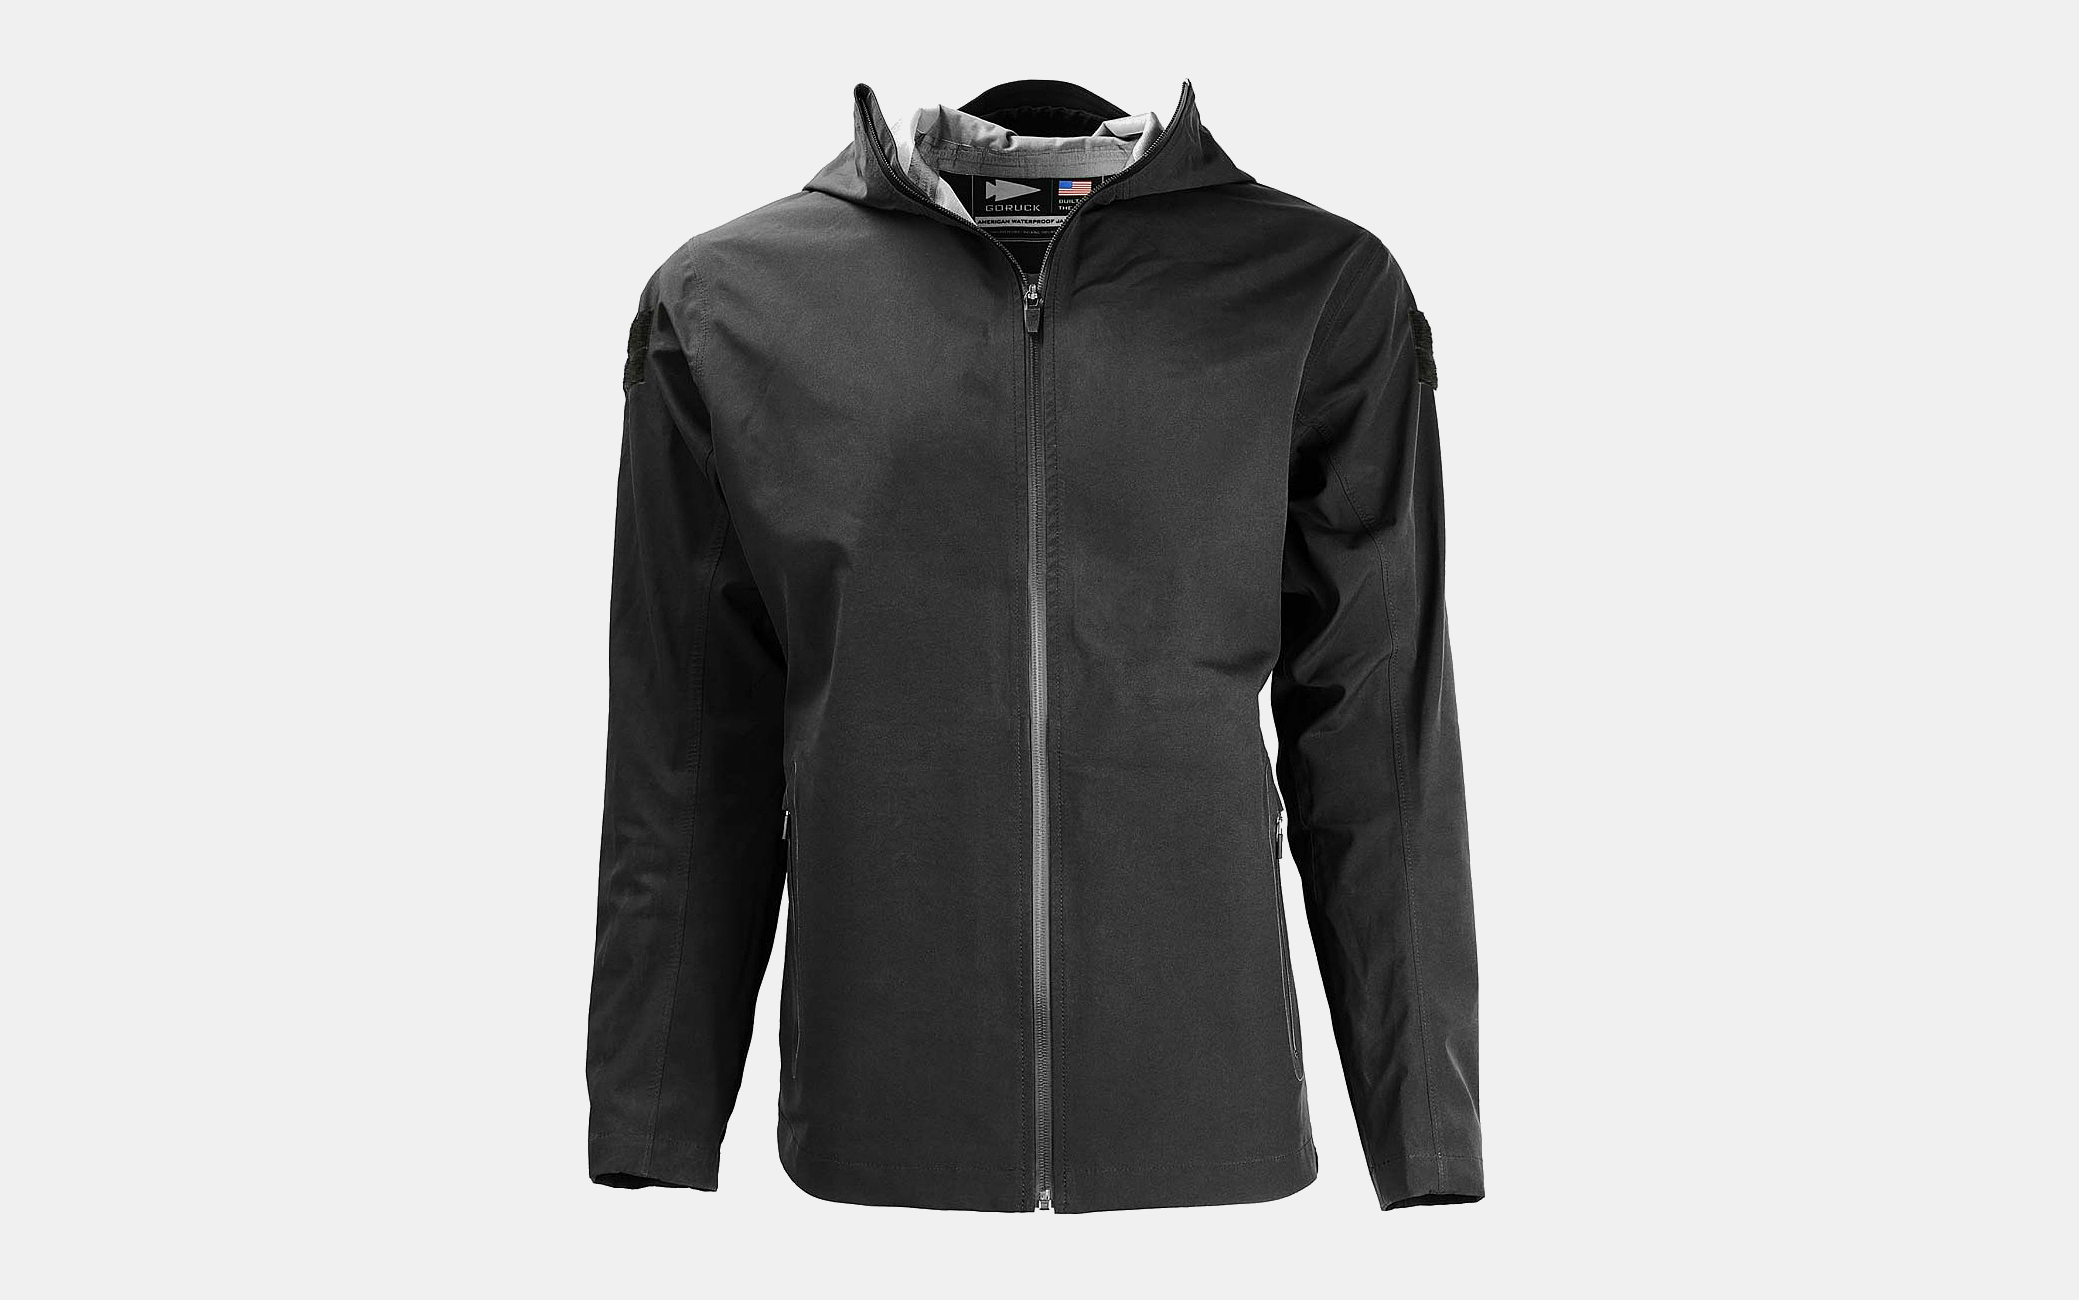 GoRuck American Waterproof Jacket